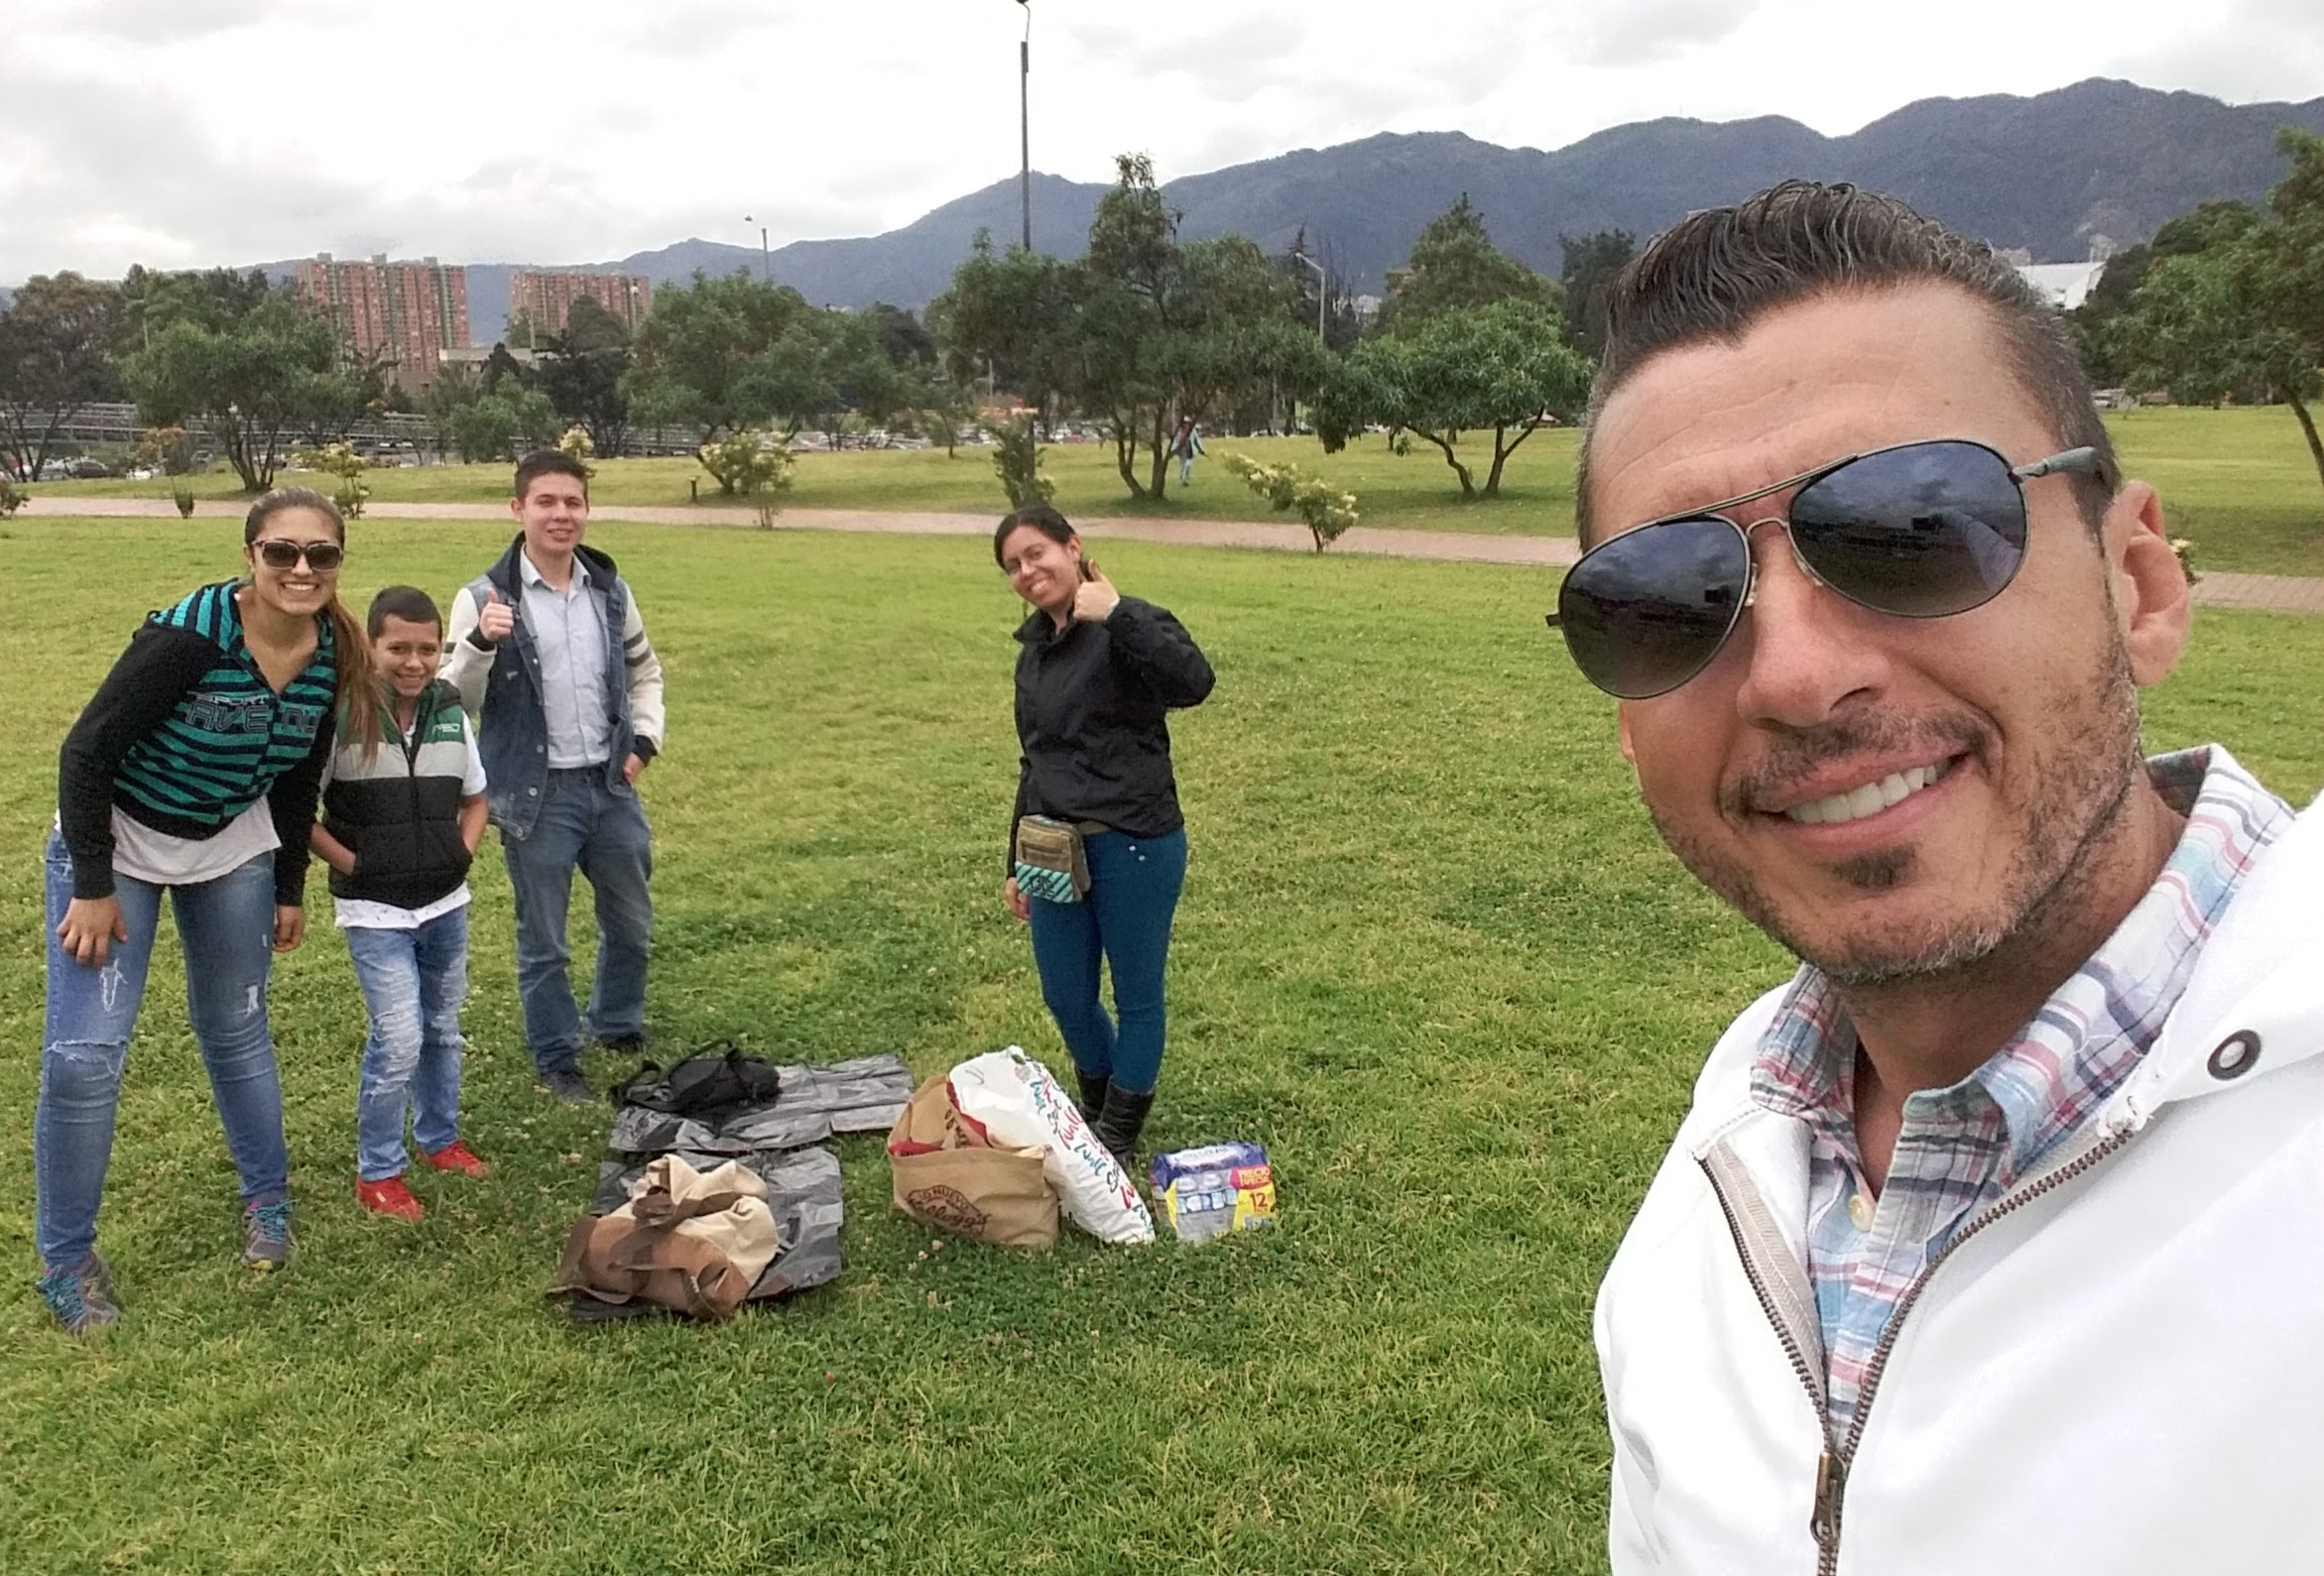 kite day sep 1 2018